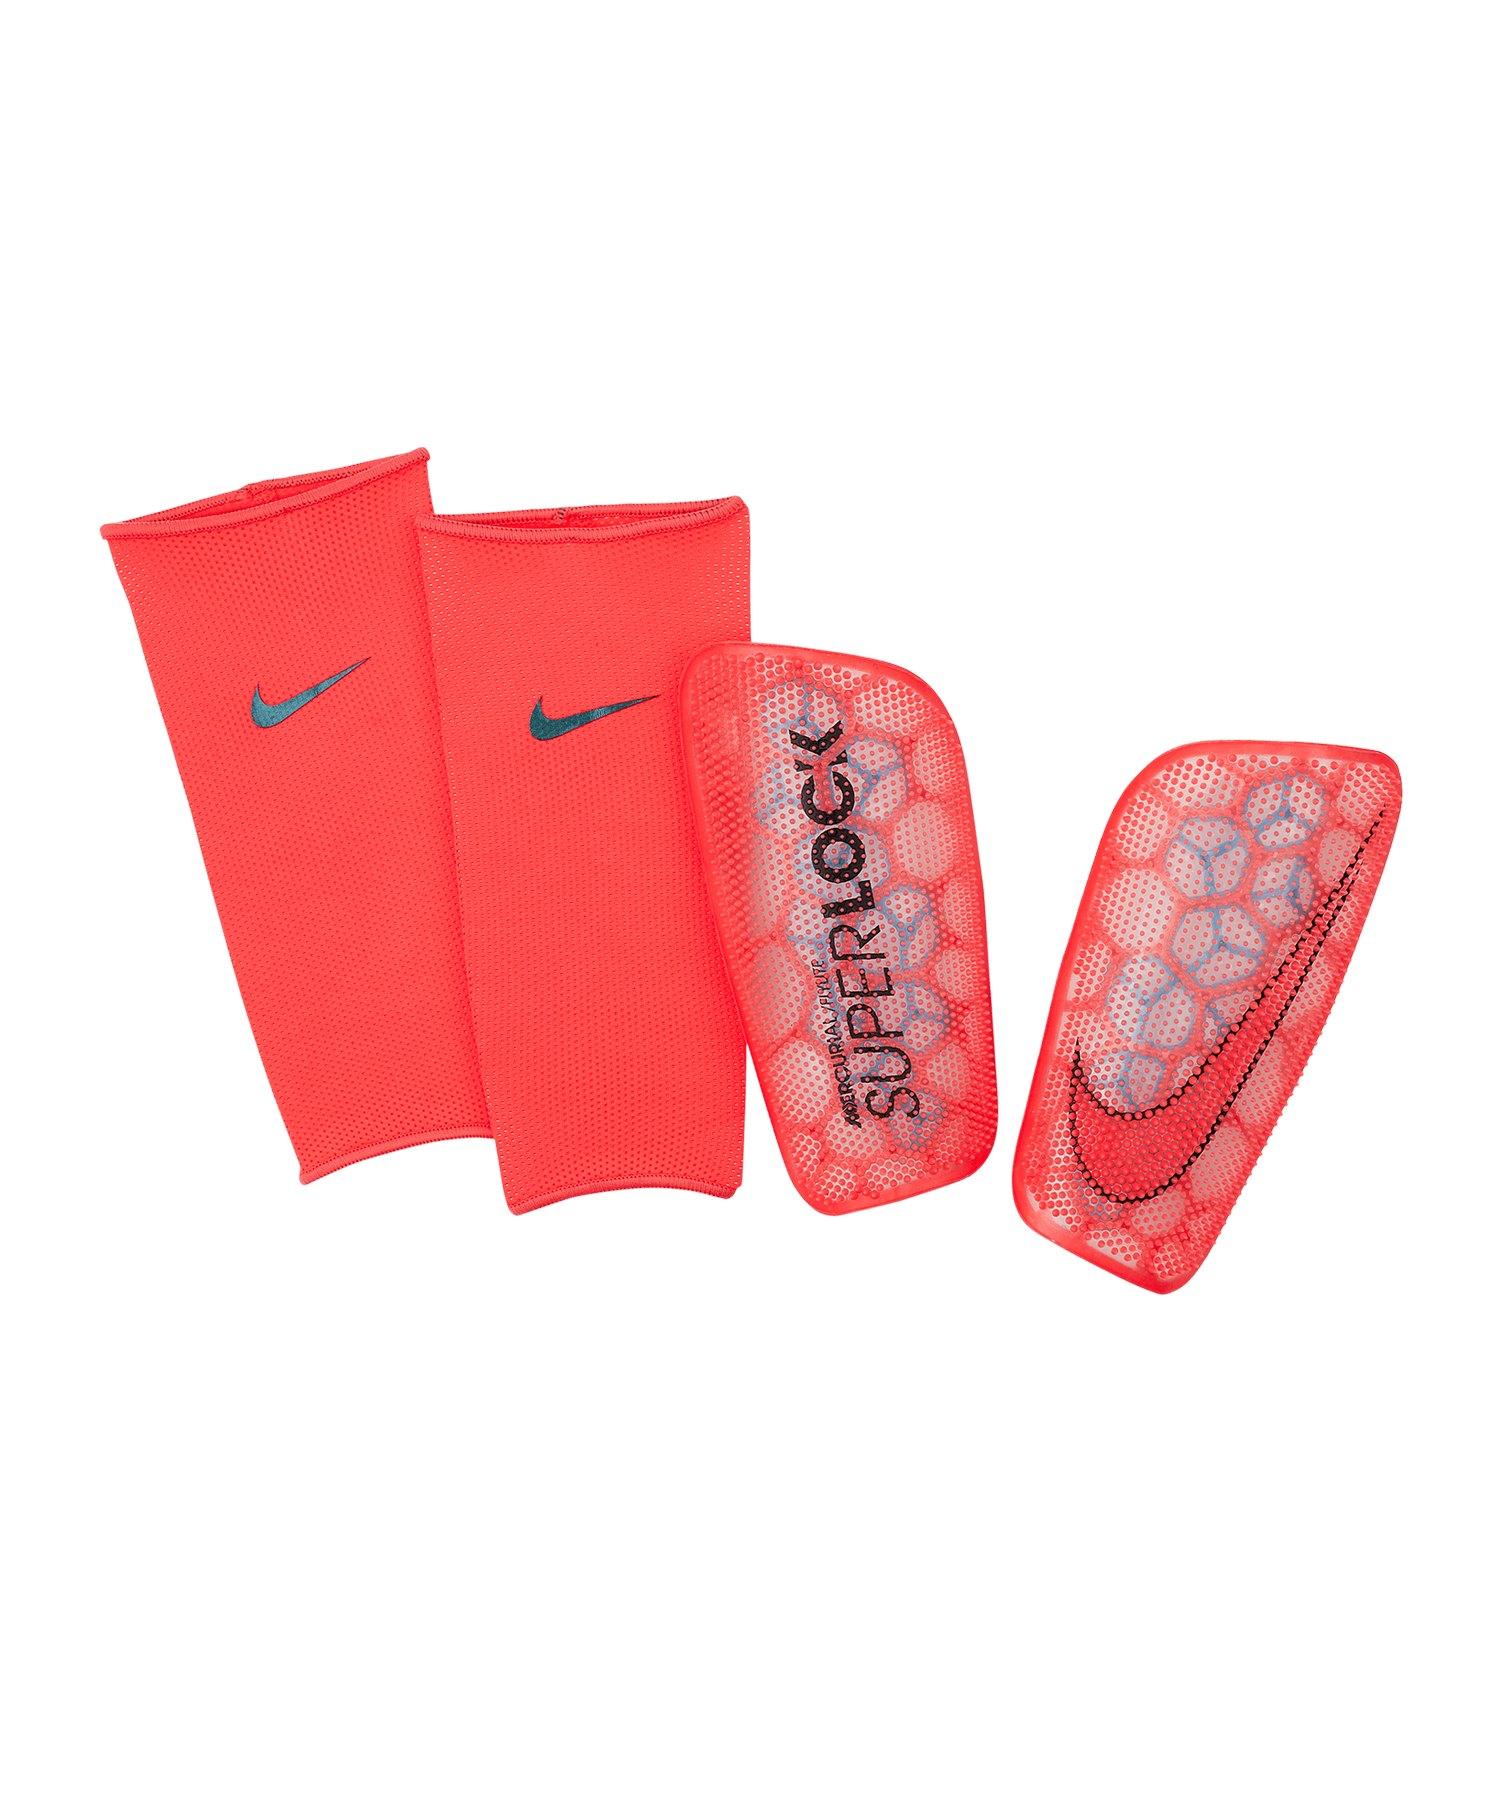 Nike Mercurial FlyLite Superlock Schoner Rot F644 - rot